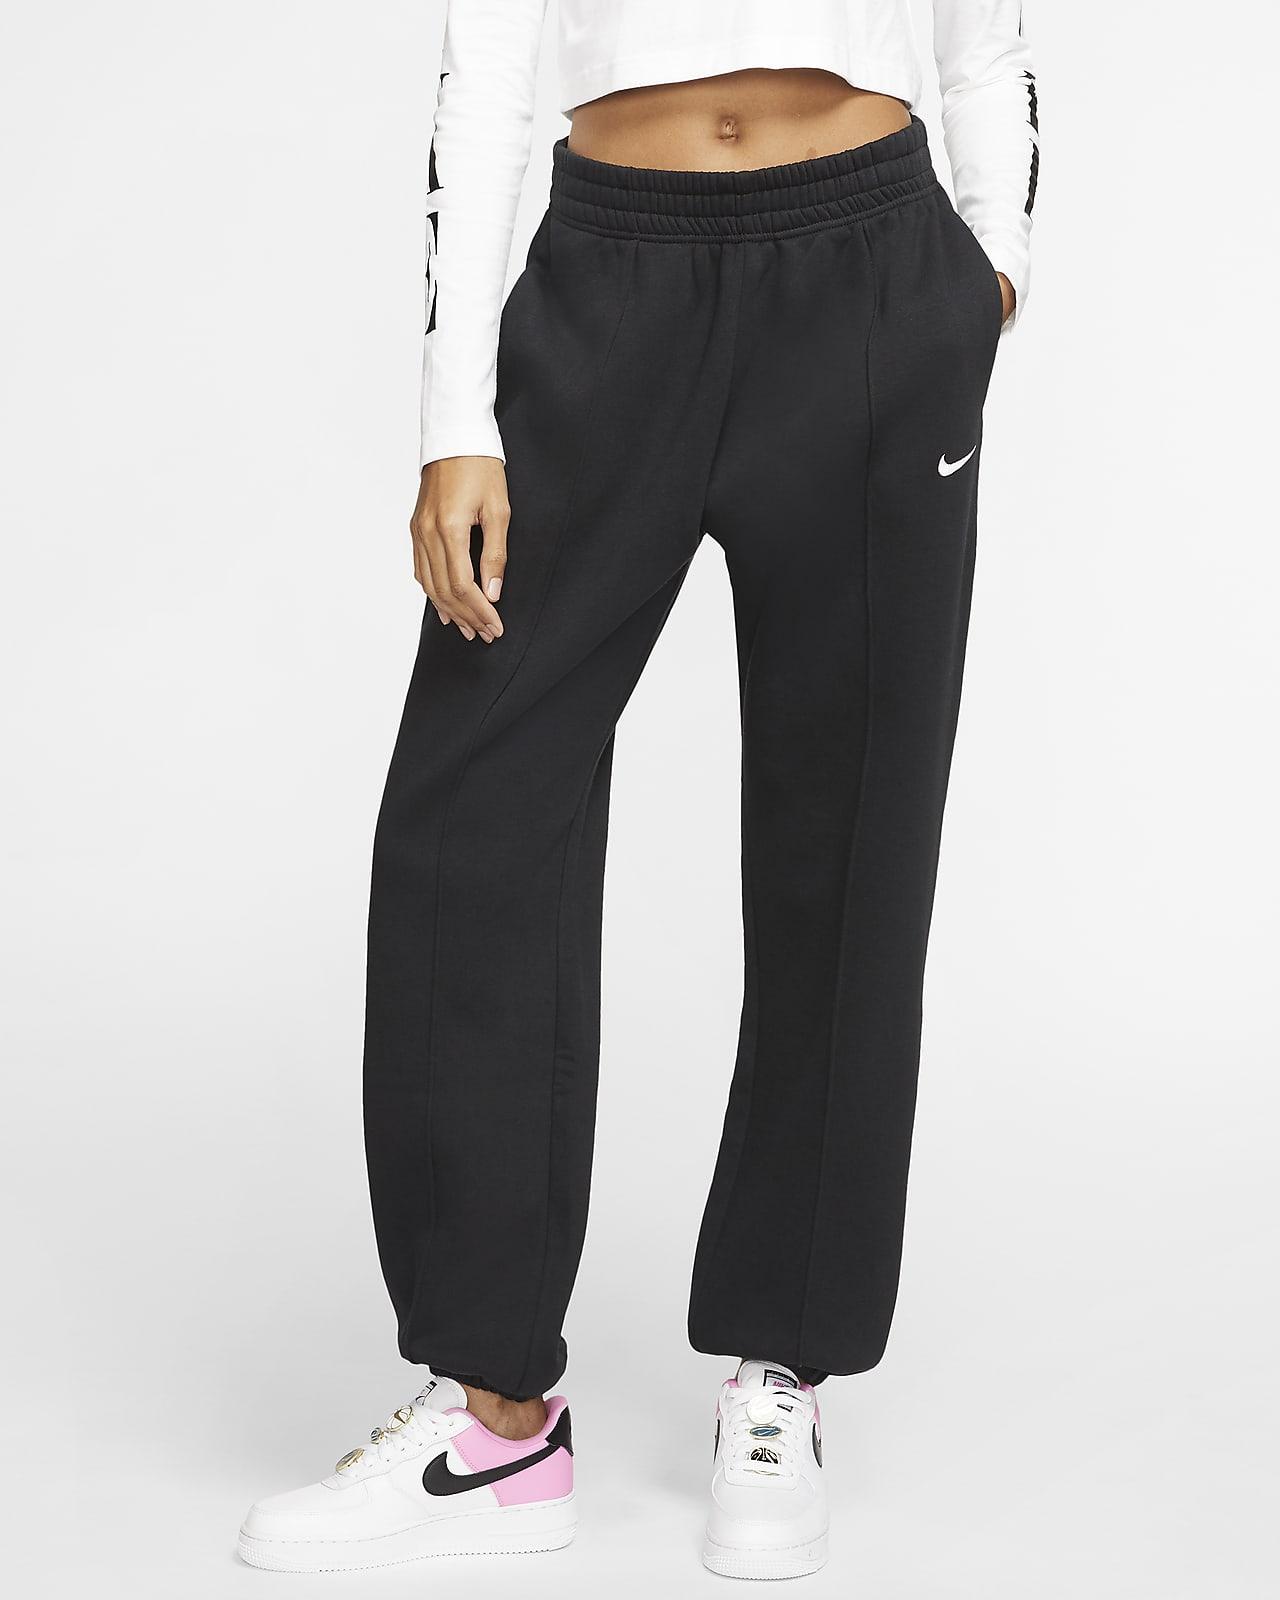 Pantaloni in fleece Nike Sportswear Essential Collection - Donna